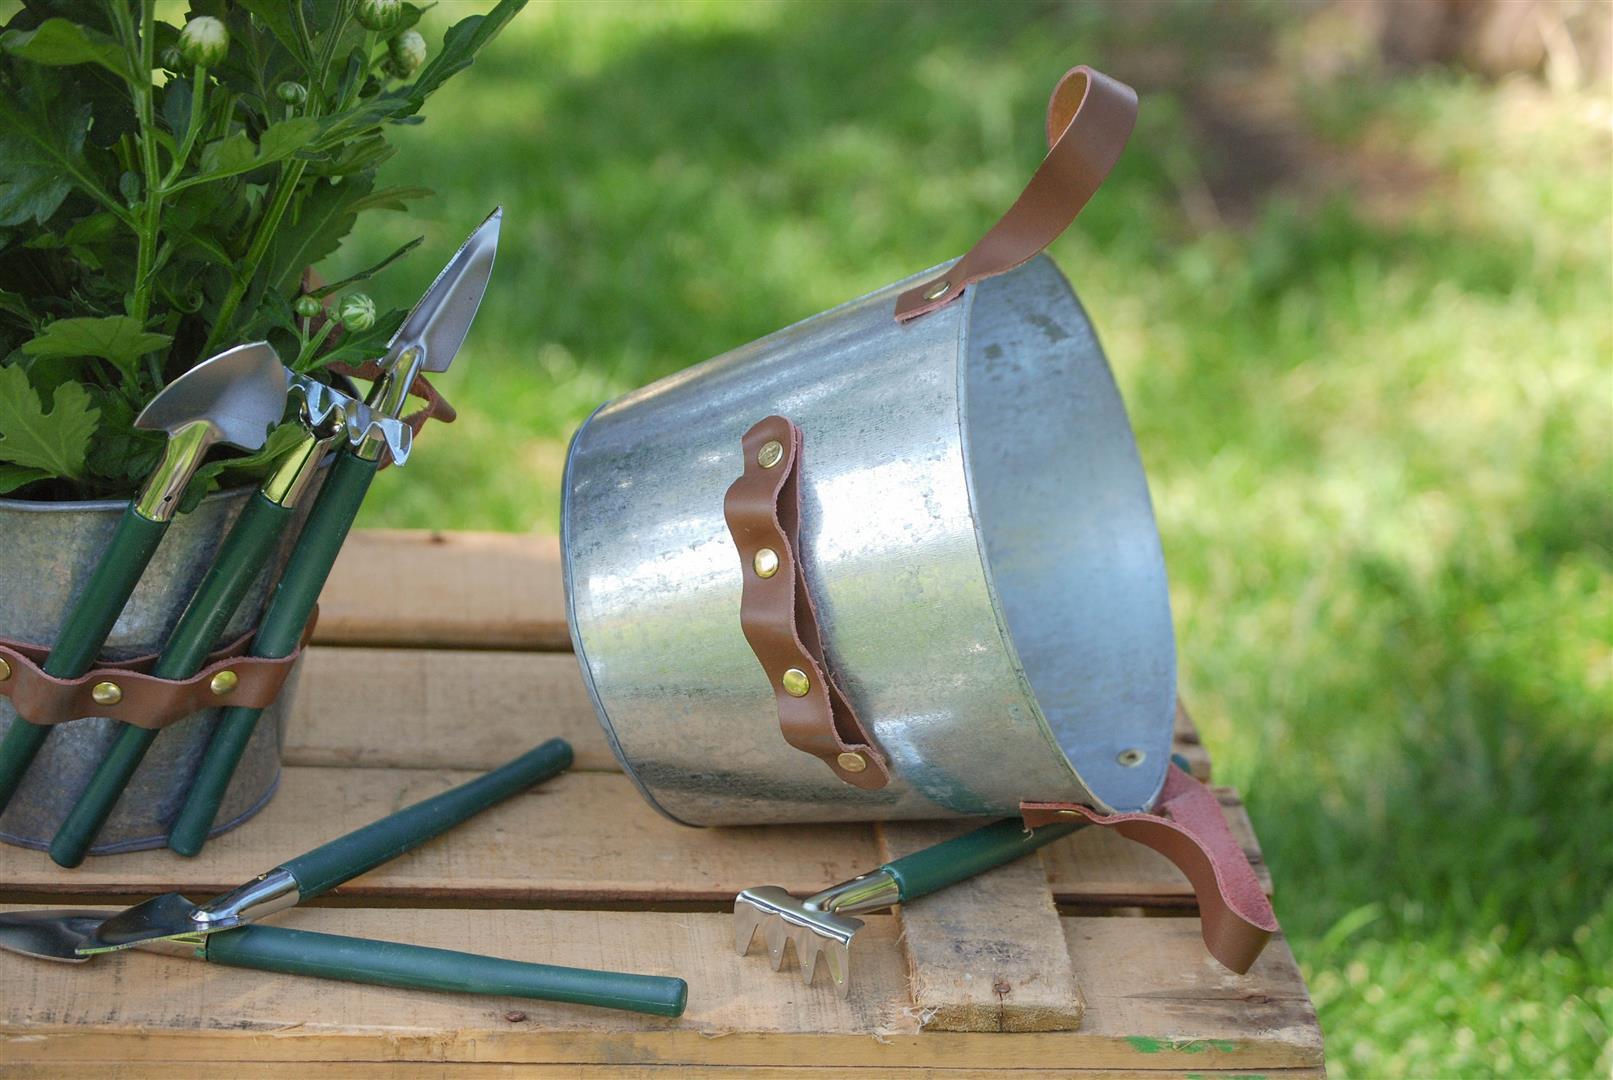 macetero-zinc-utensilios-pala-rastrillo (2)